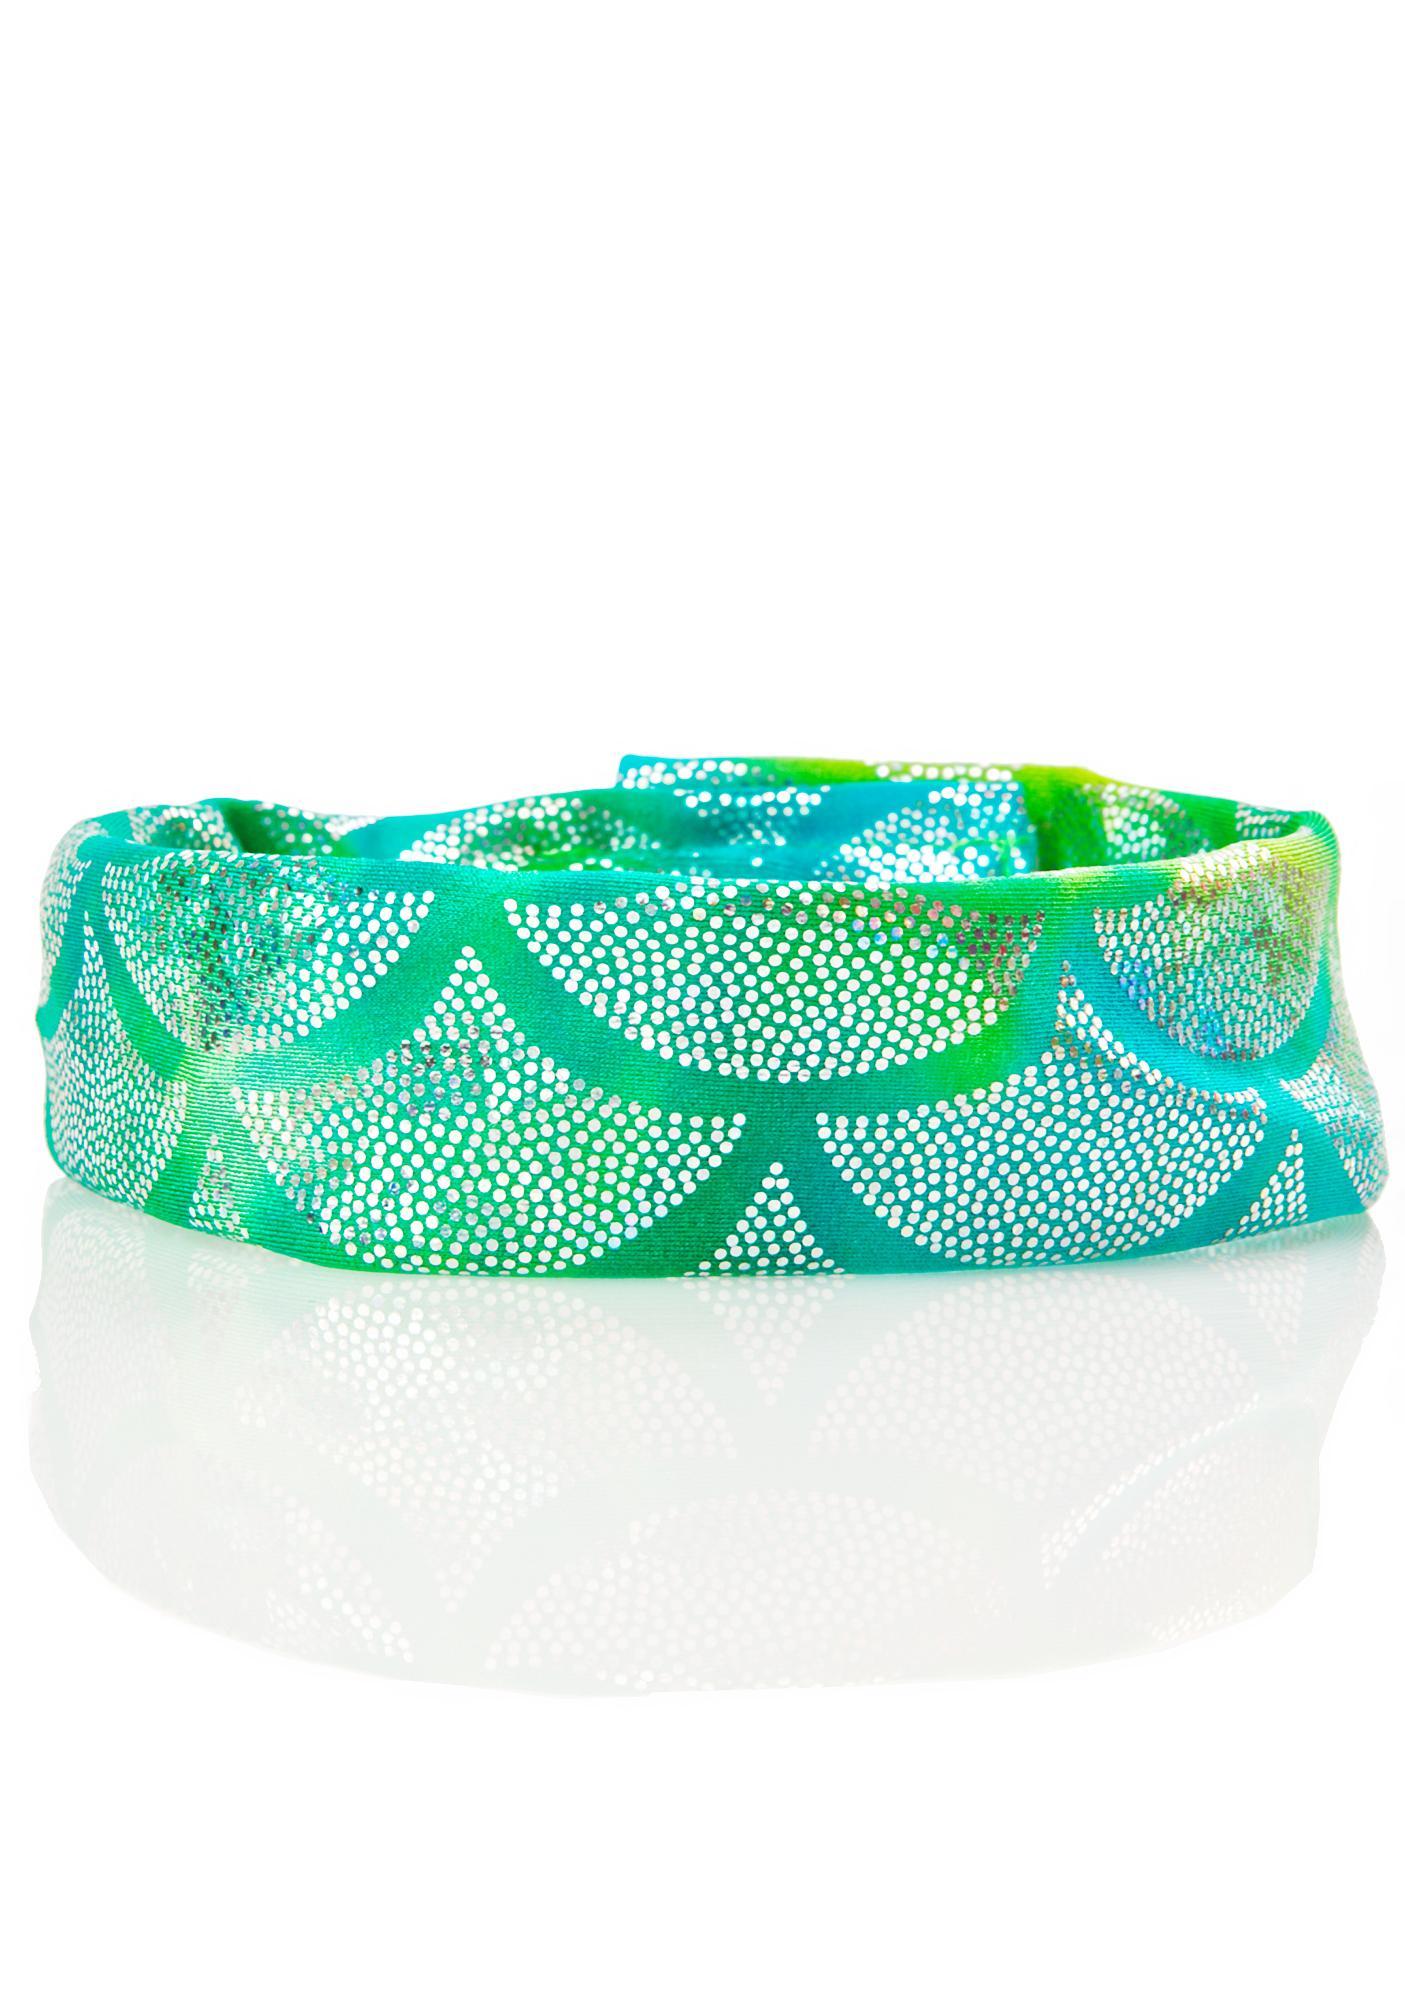 J Valentine Aqua Light-Up Mermaid Choker